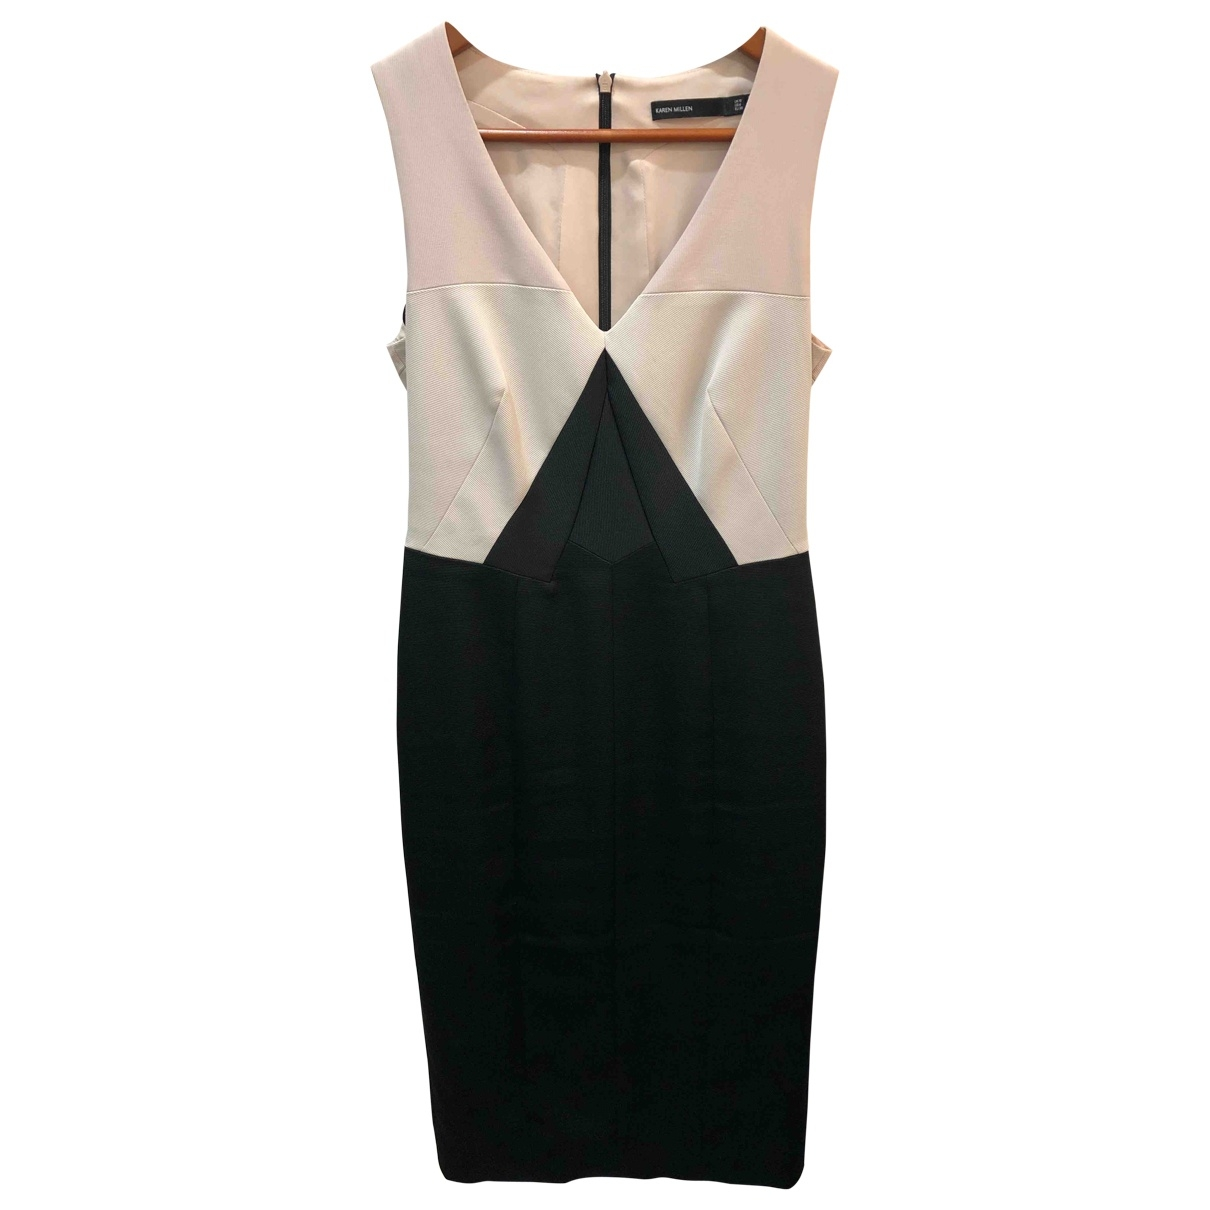 Karen Millen \N Cotton dress for Women 10 UK